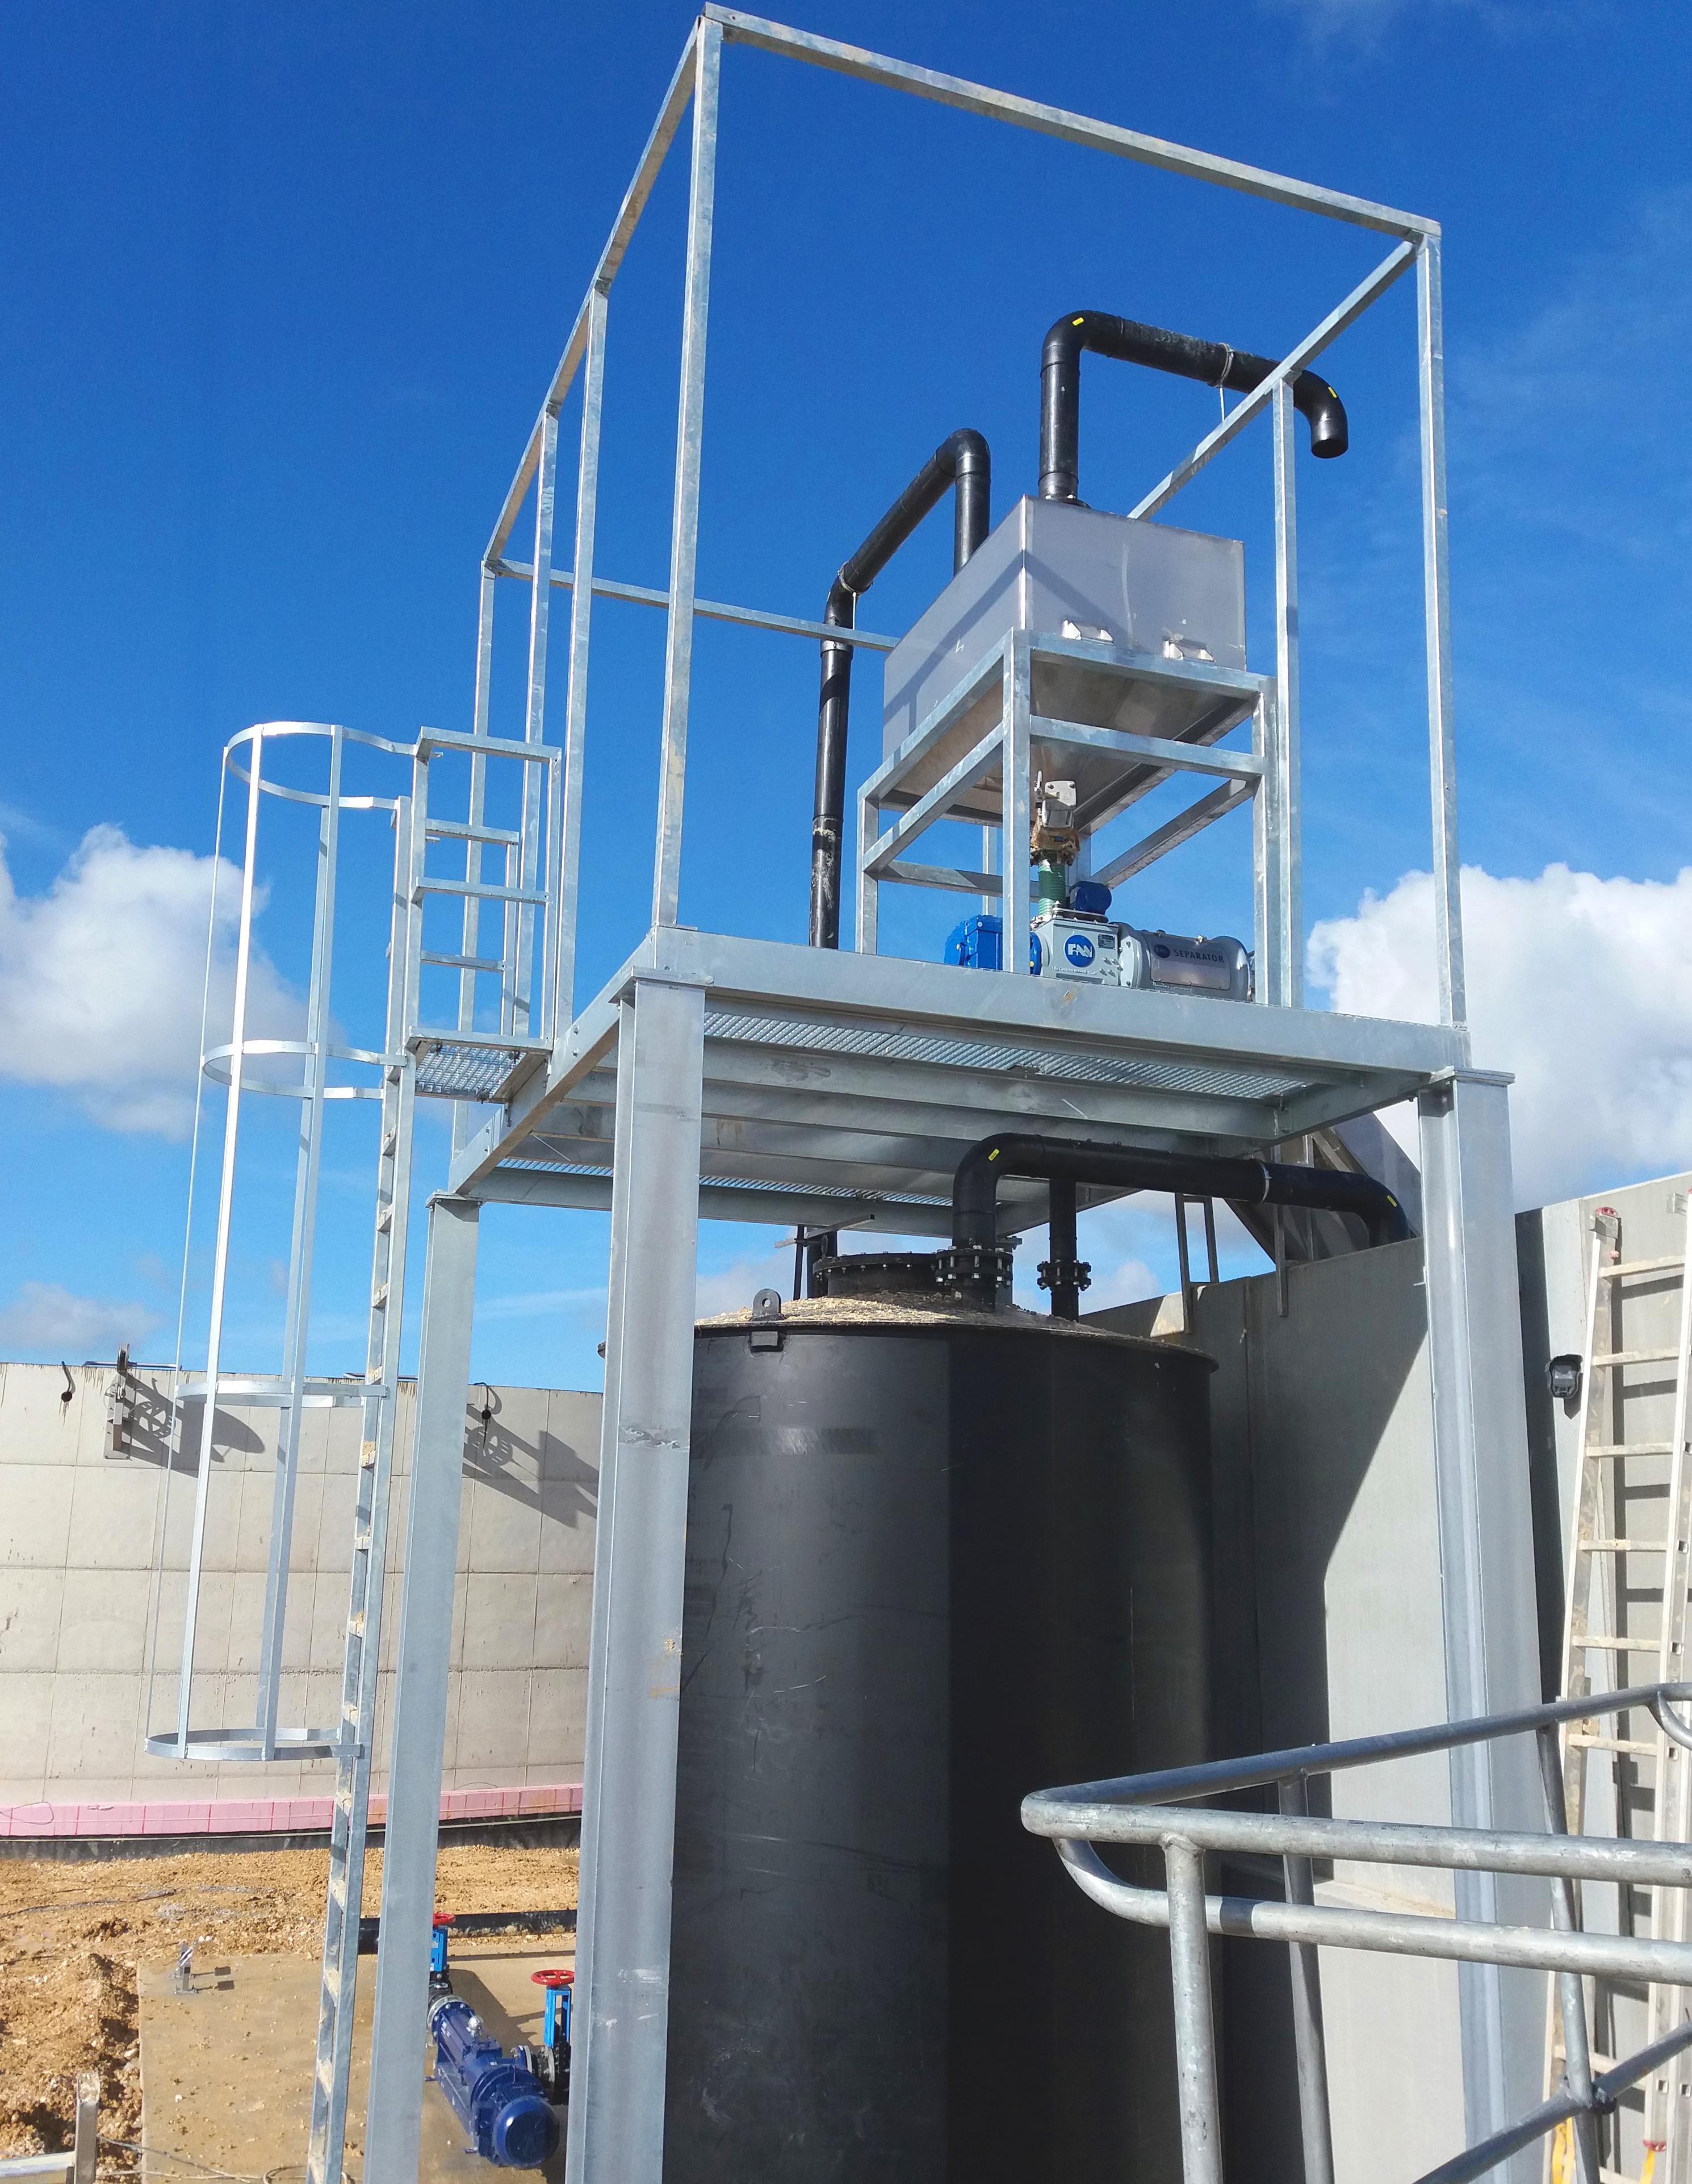 Biogas Fertioise Coudun France 11 Platformas-Fertioise-ENVITEC-Planta-Biogas-Compiegne-Francia